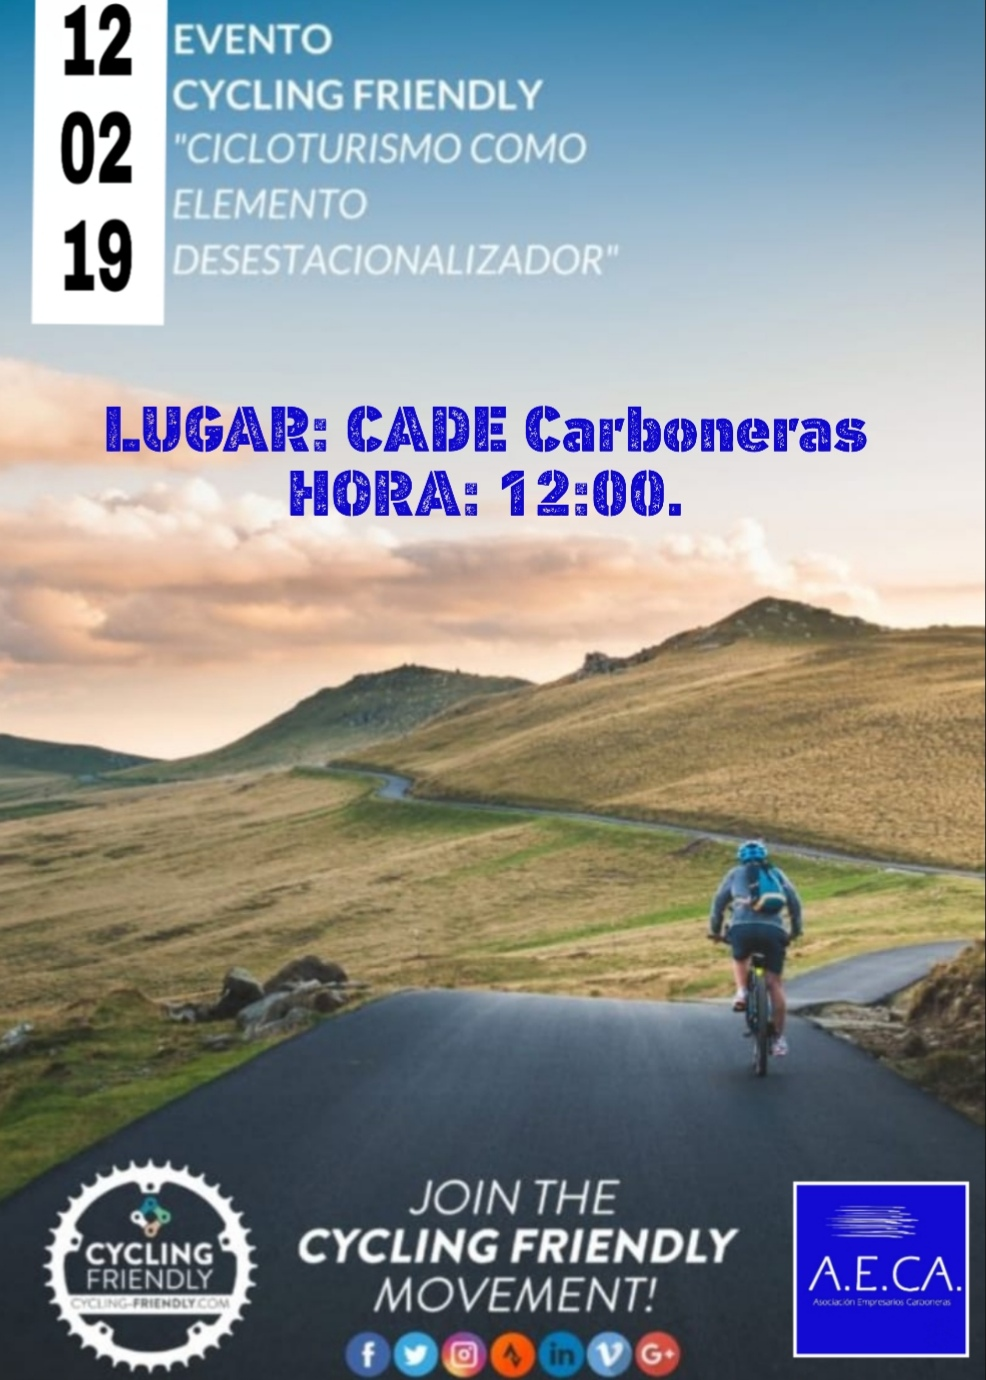 Evento Cycling friendly